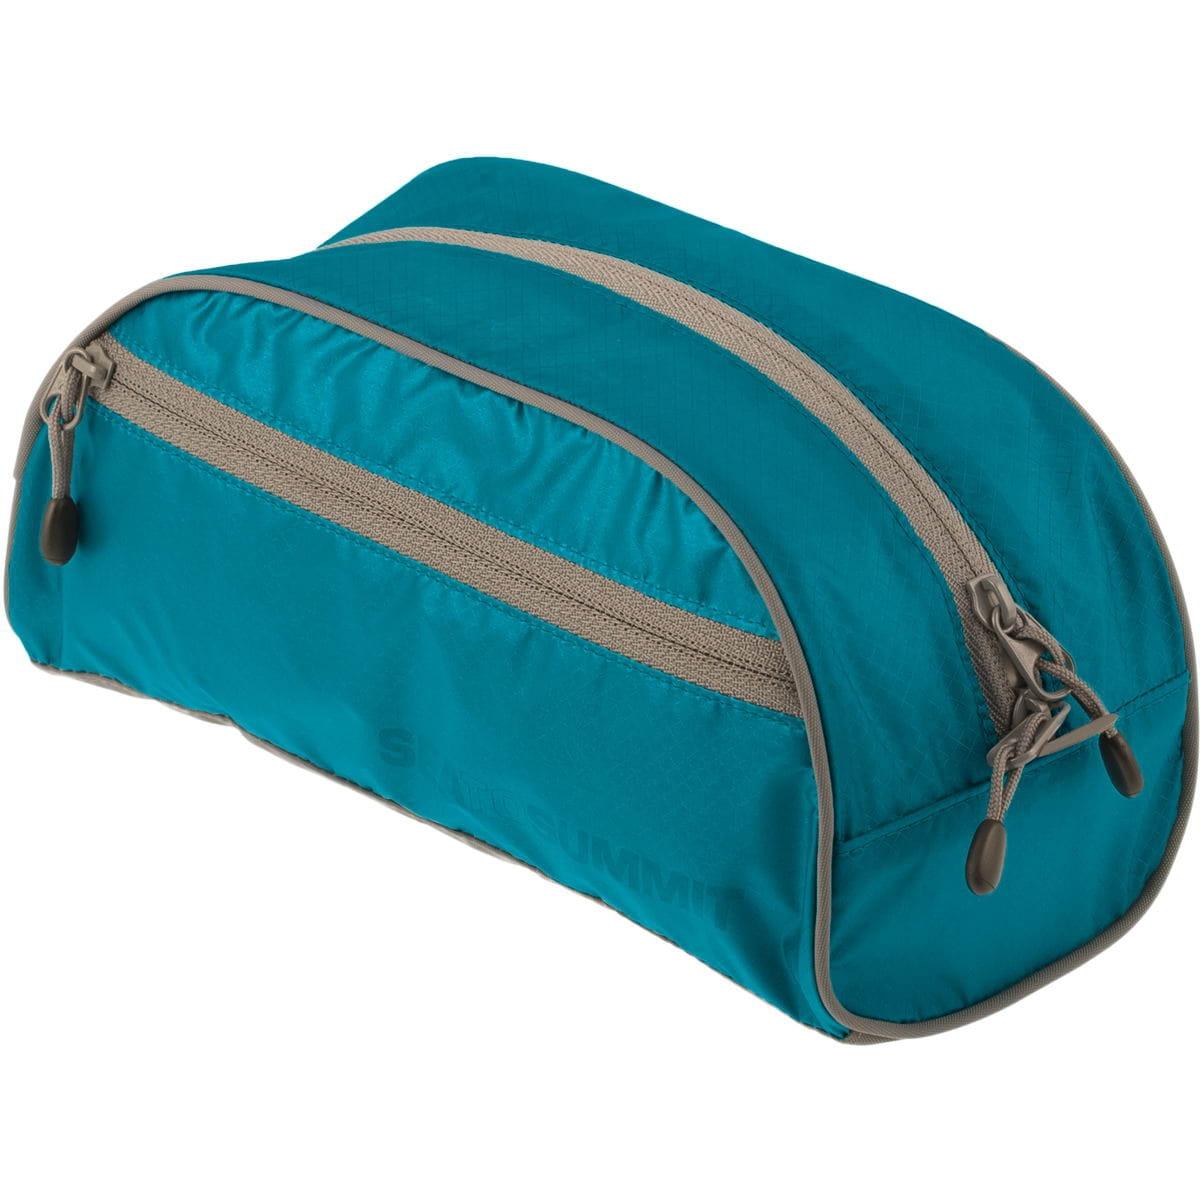 Sea to Summit TravellingLight™ Toiletry Bag S - Waschtasche blue-grey - Bild 1